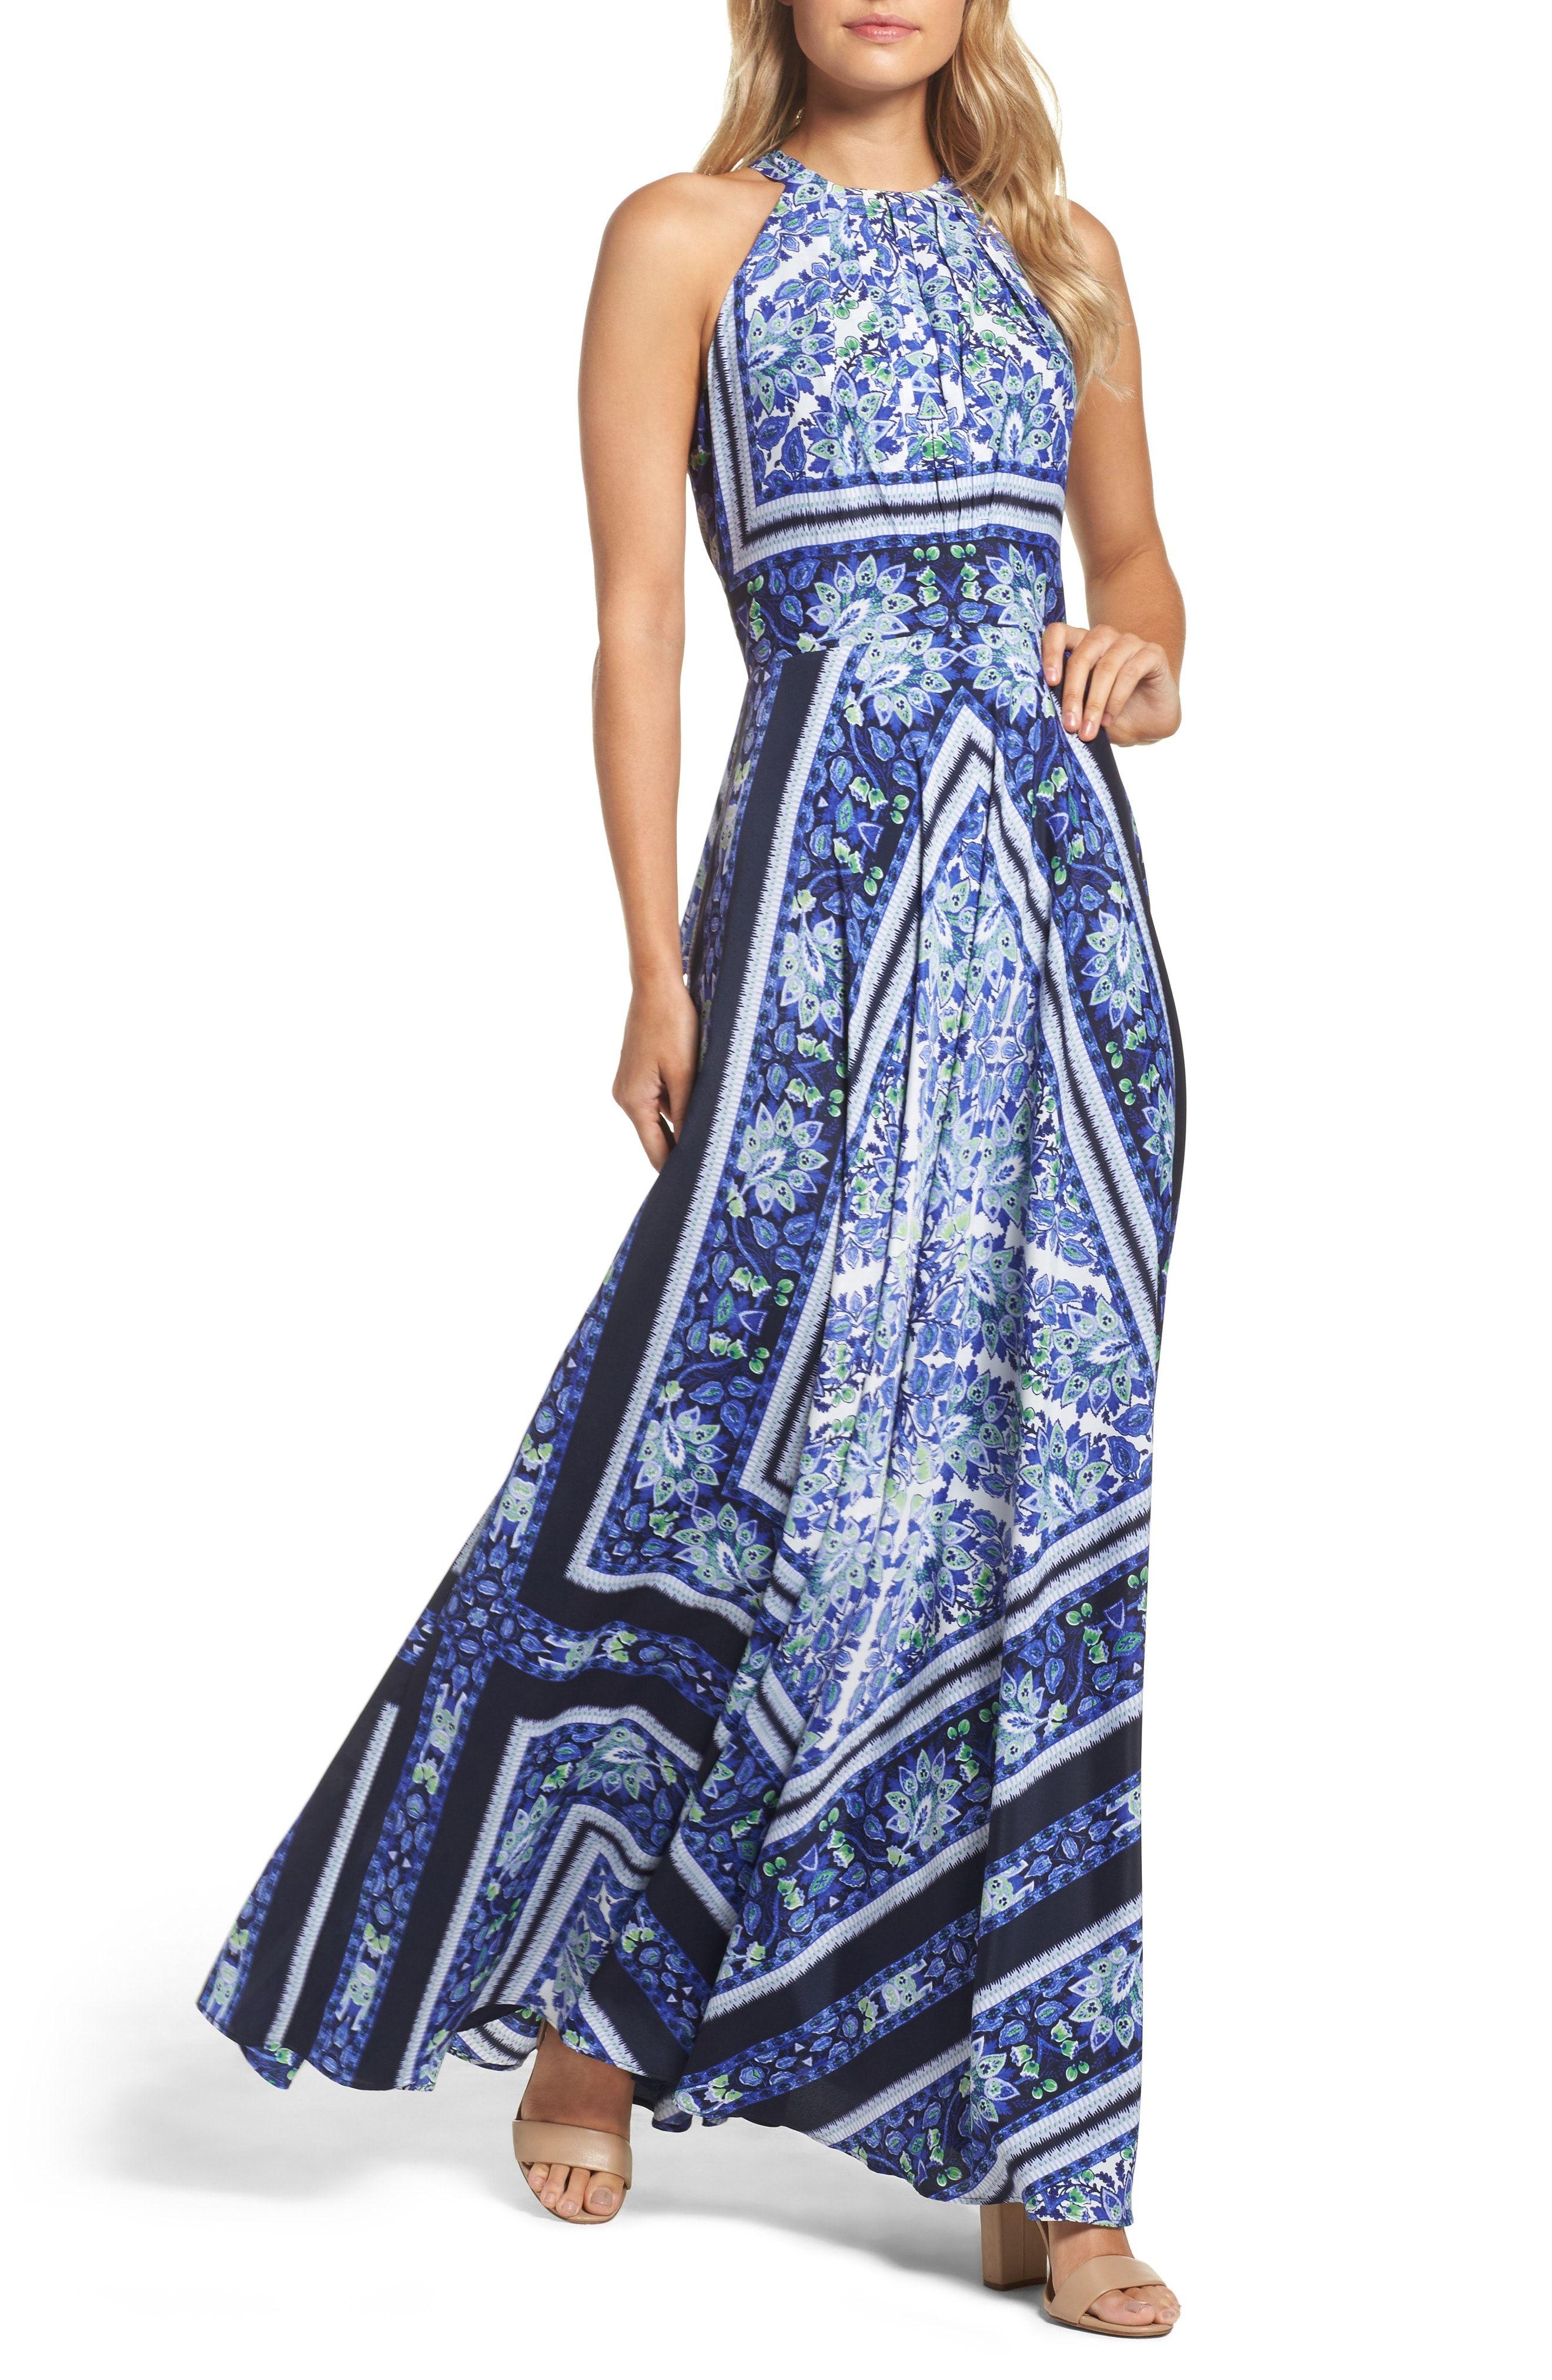 New eliza j scarf print maxi dress regular amp petite online sku